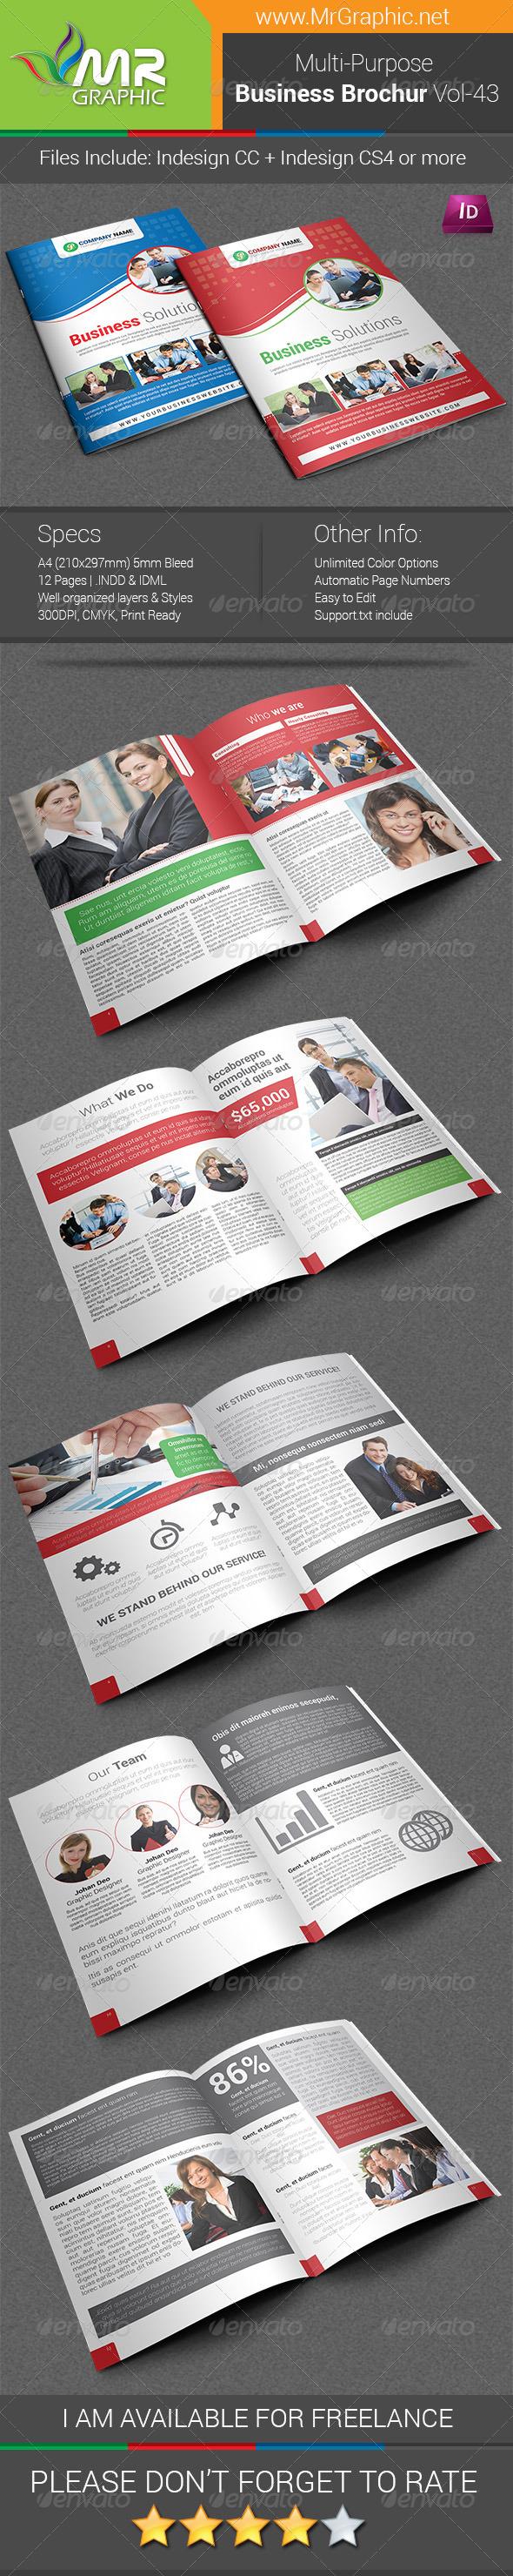 Multipurpose Business Brochure Template Vol-43 - Corporate Brochures